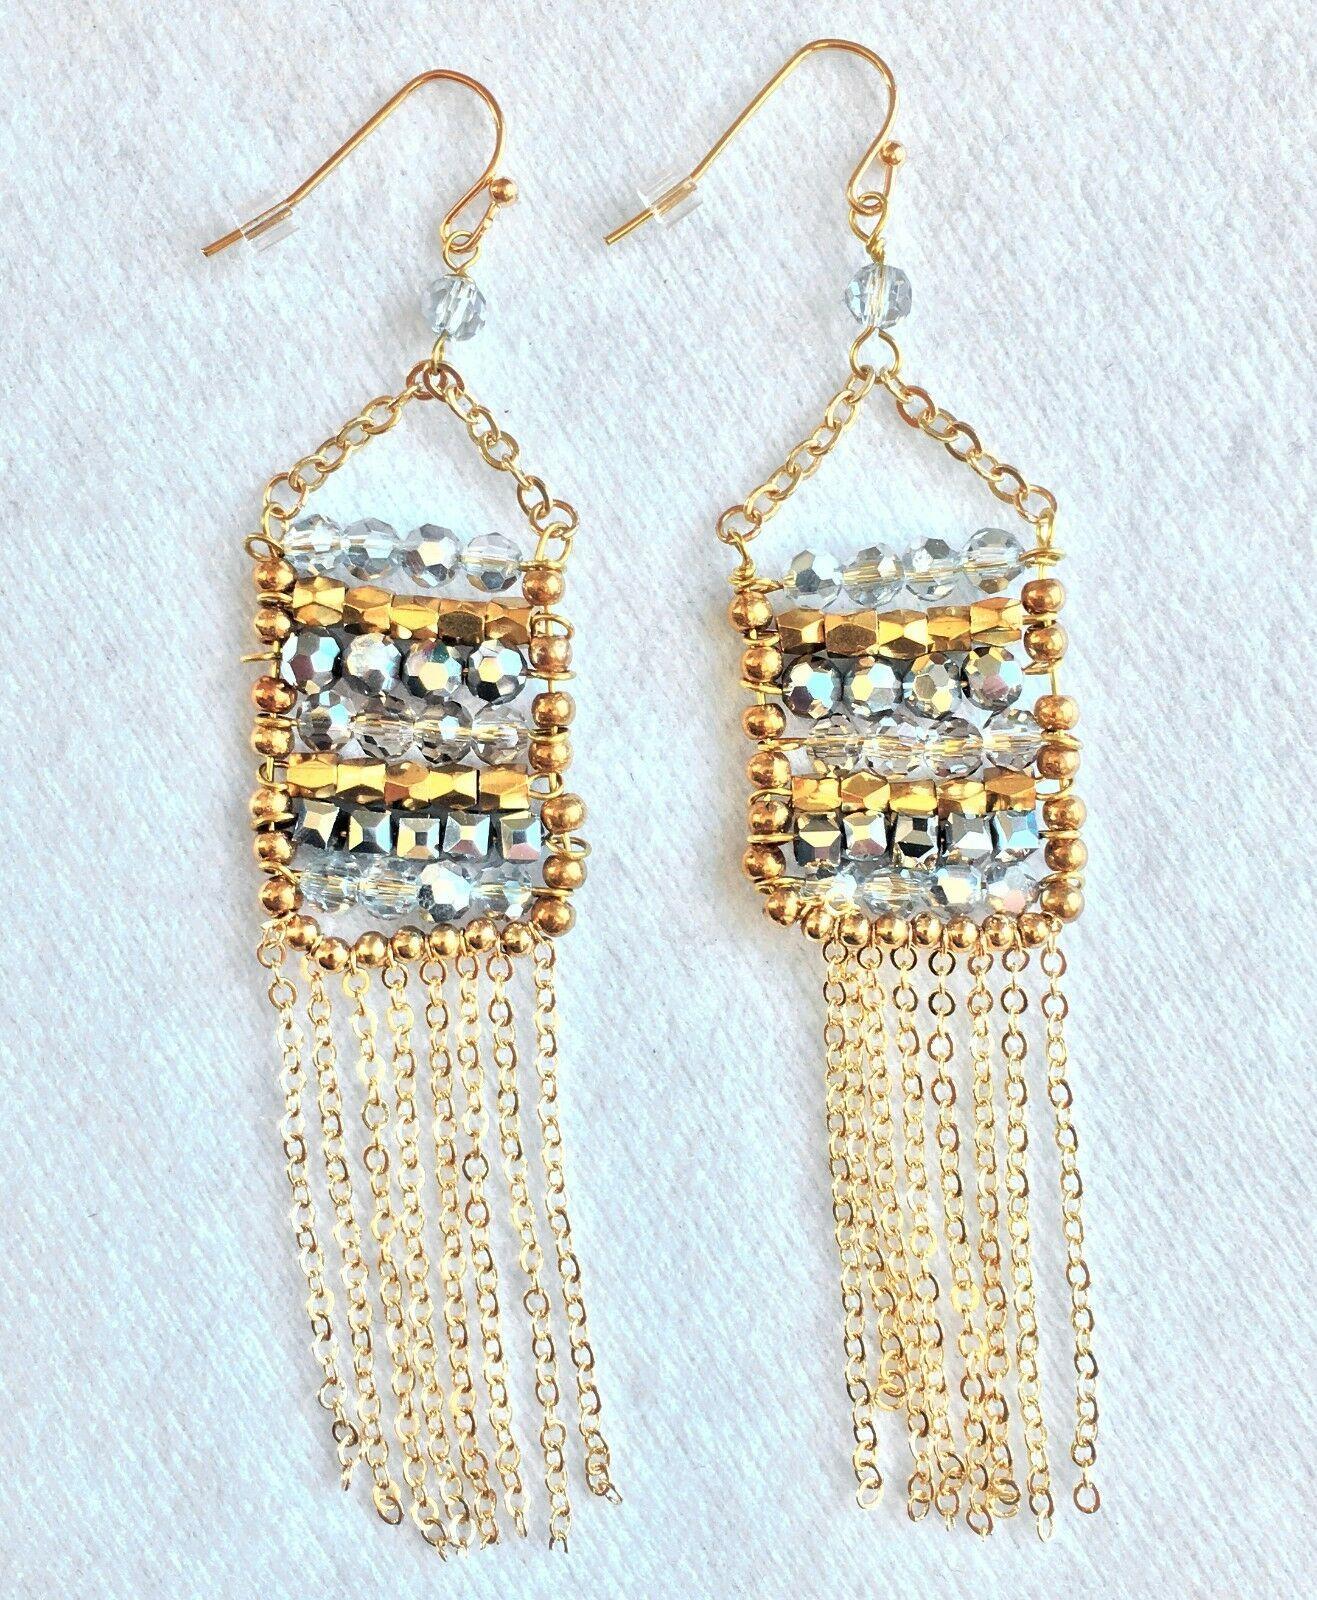 Leslie Danzis Colorblock Austrian Crystal Fringe Chain Chandelier Earrings NWT